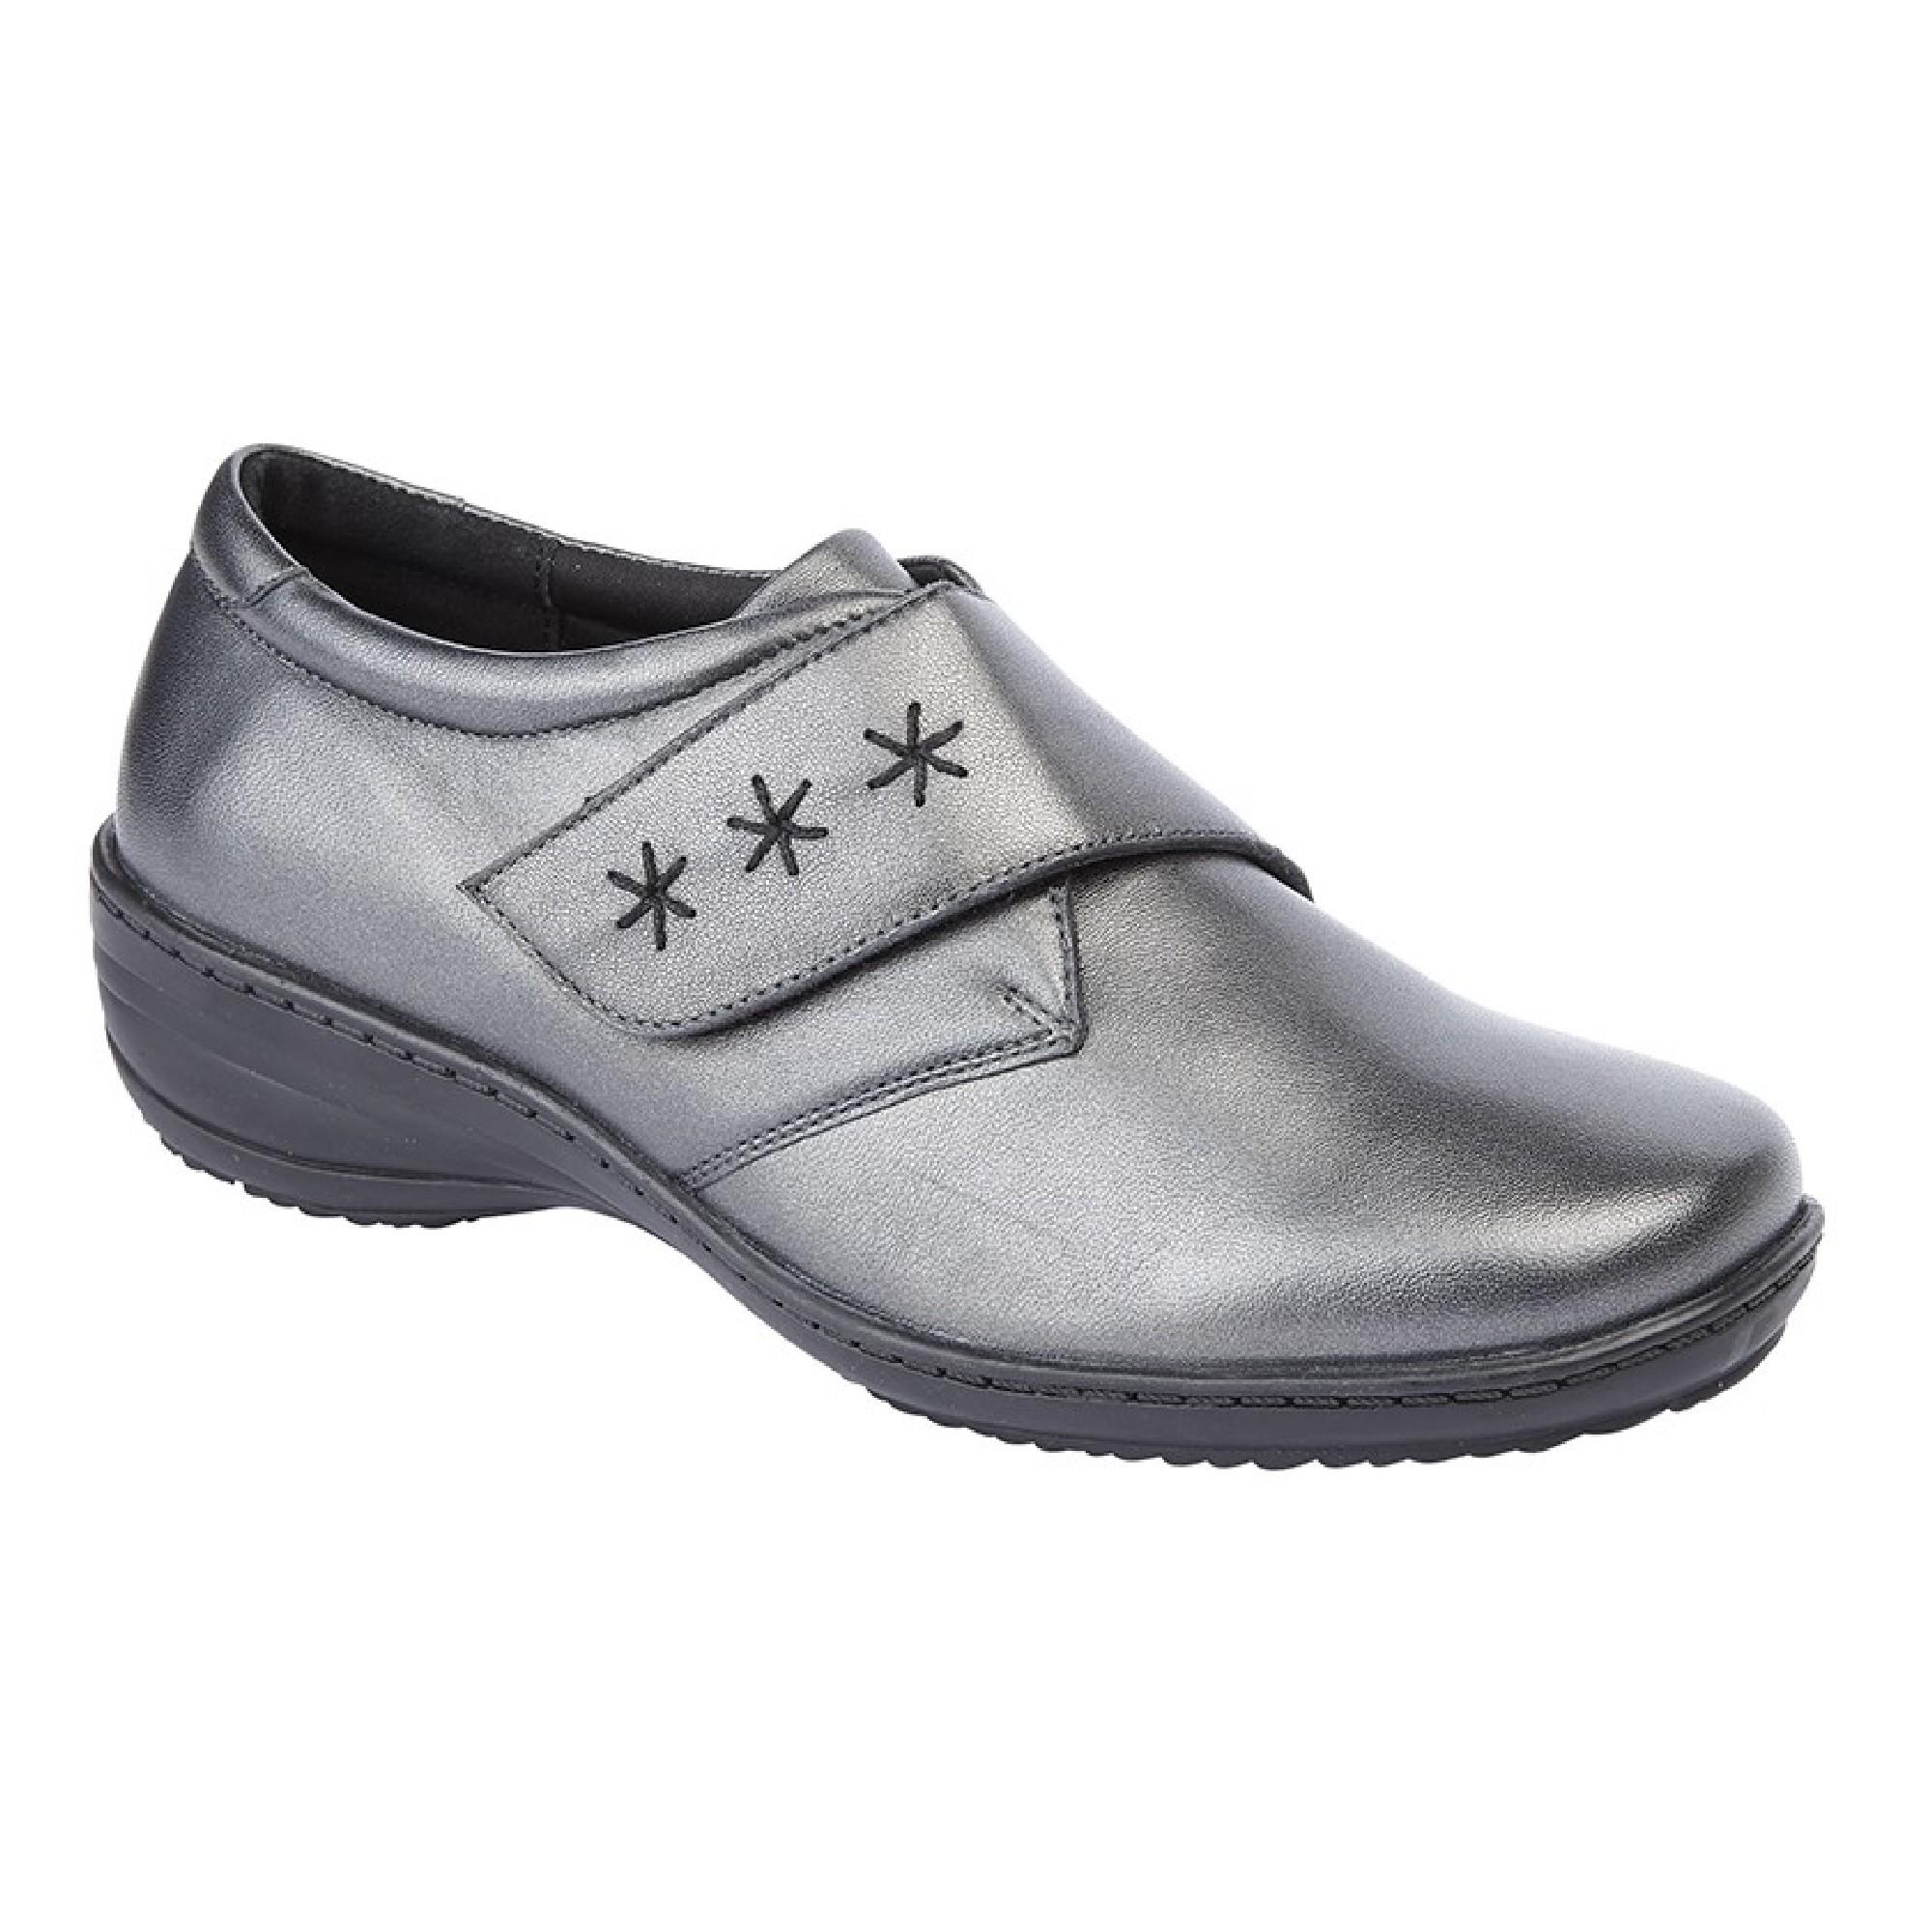 Mod Comfys Damen Memory Foam (DF1504) Leder Klettverschluss Schuhe (DF1504) Foam 3bd177